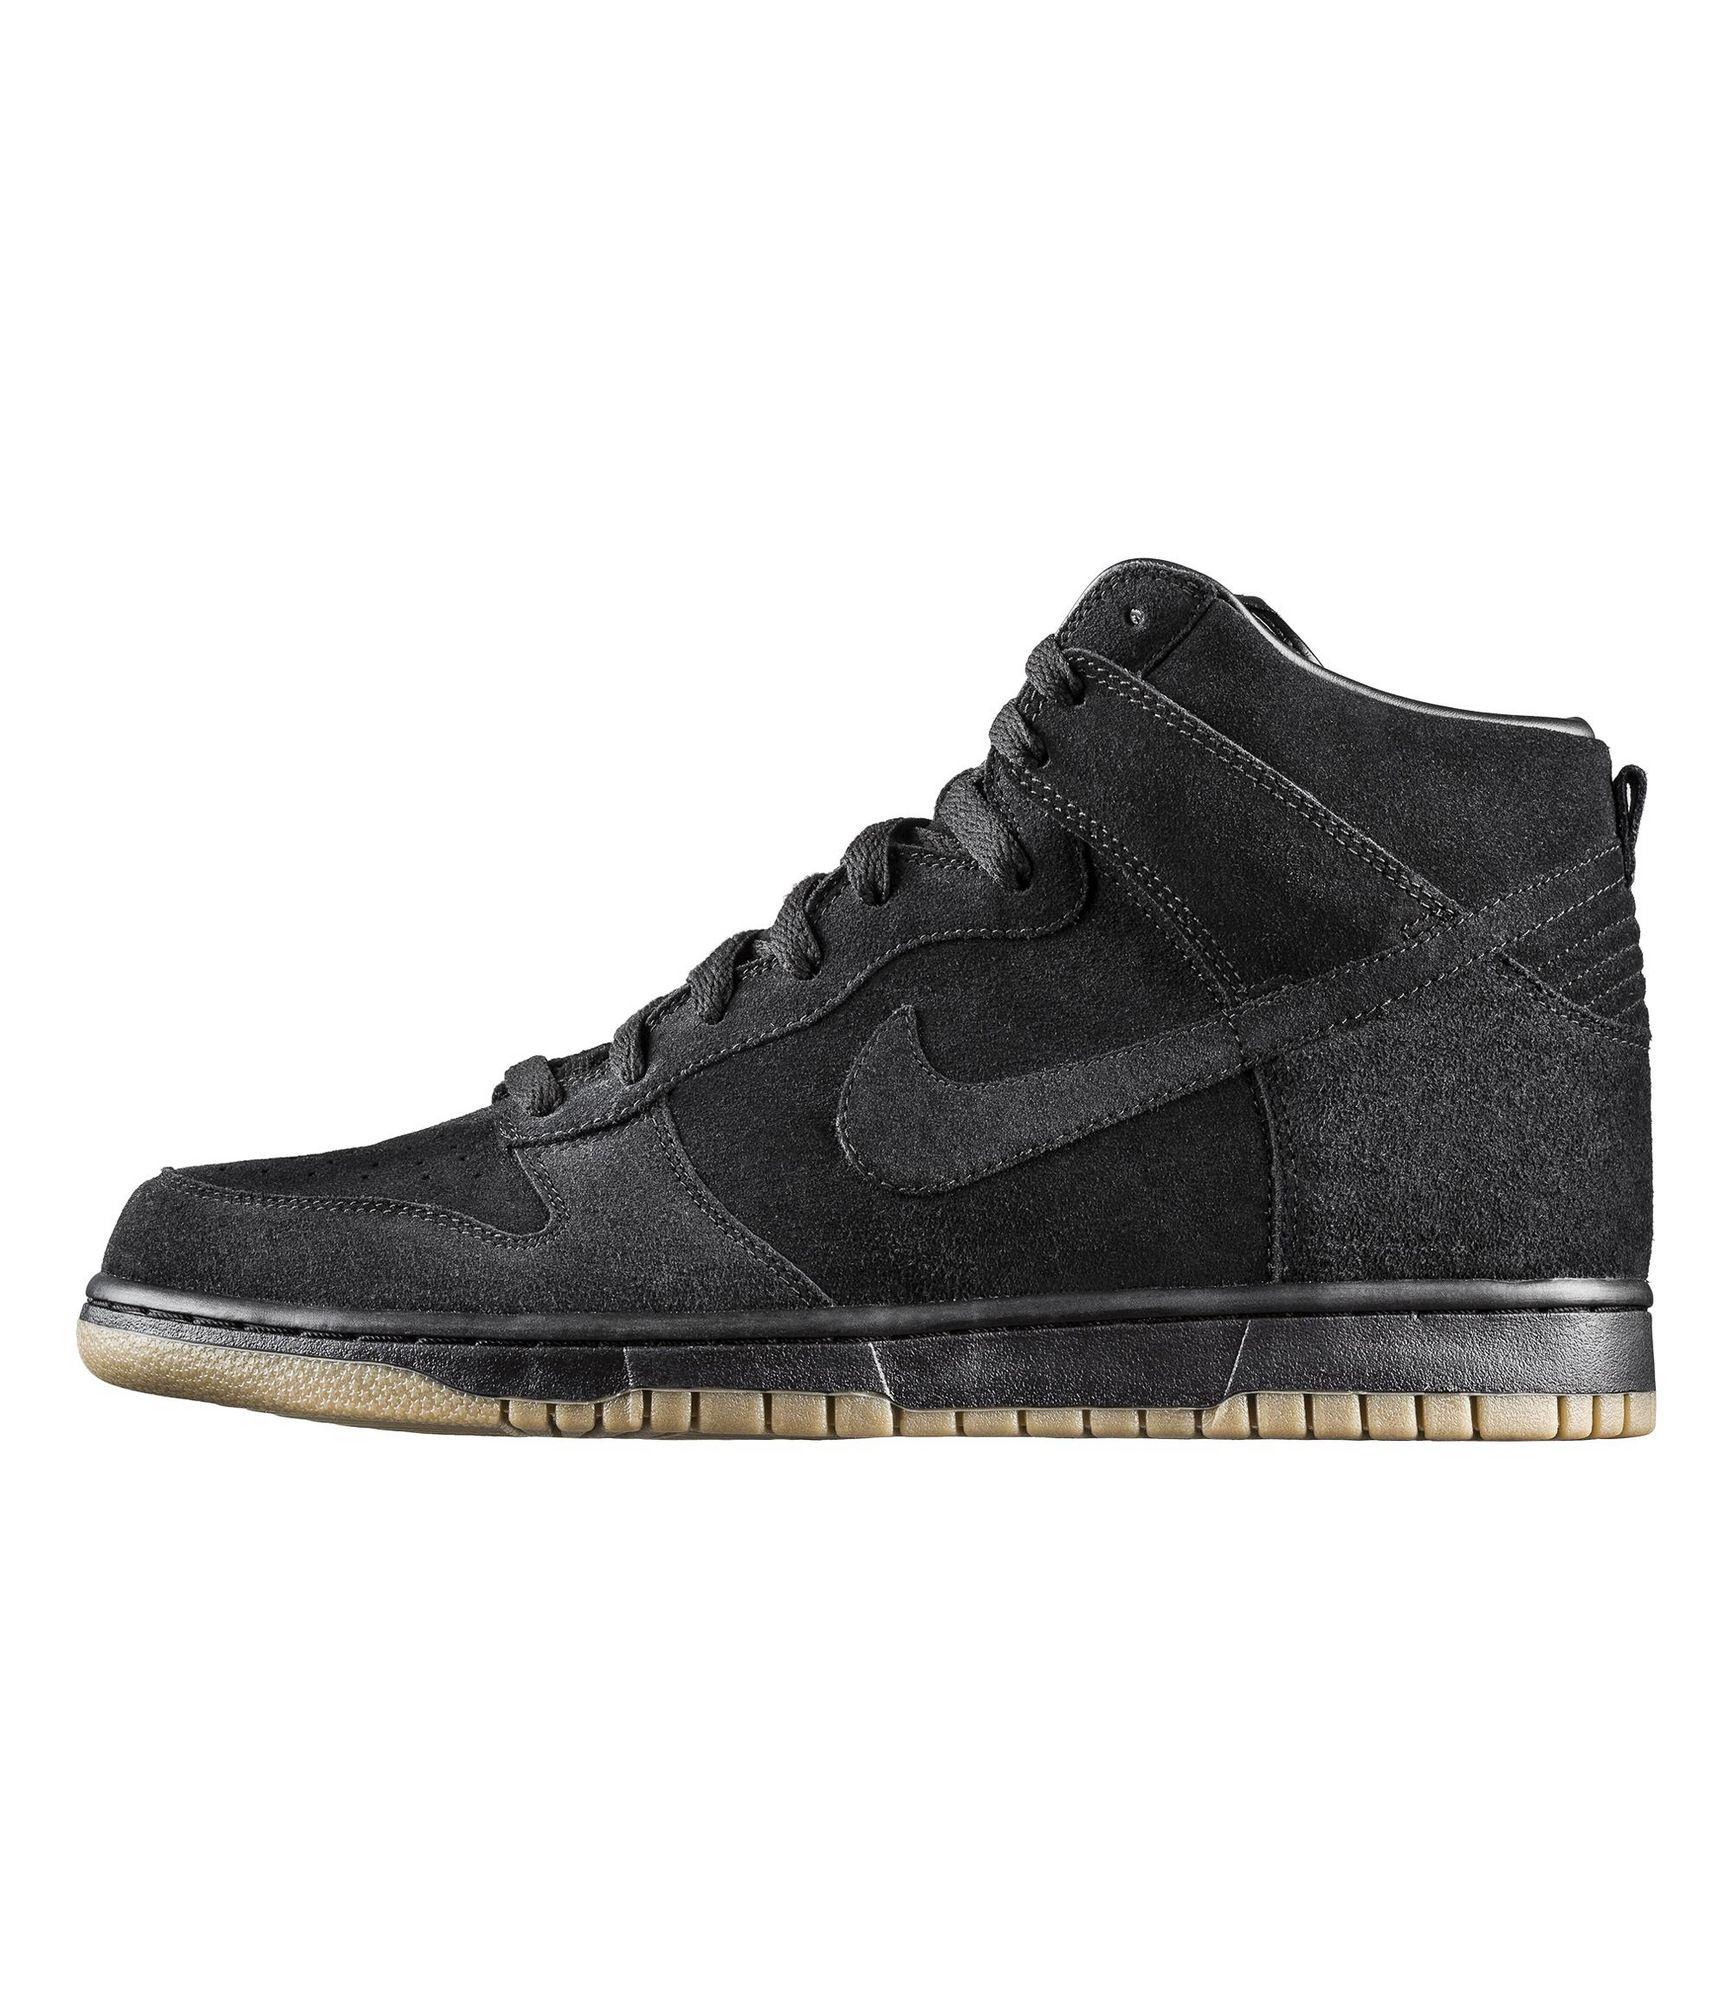 Nike x A.P.C Dunk High black suede